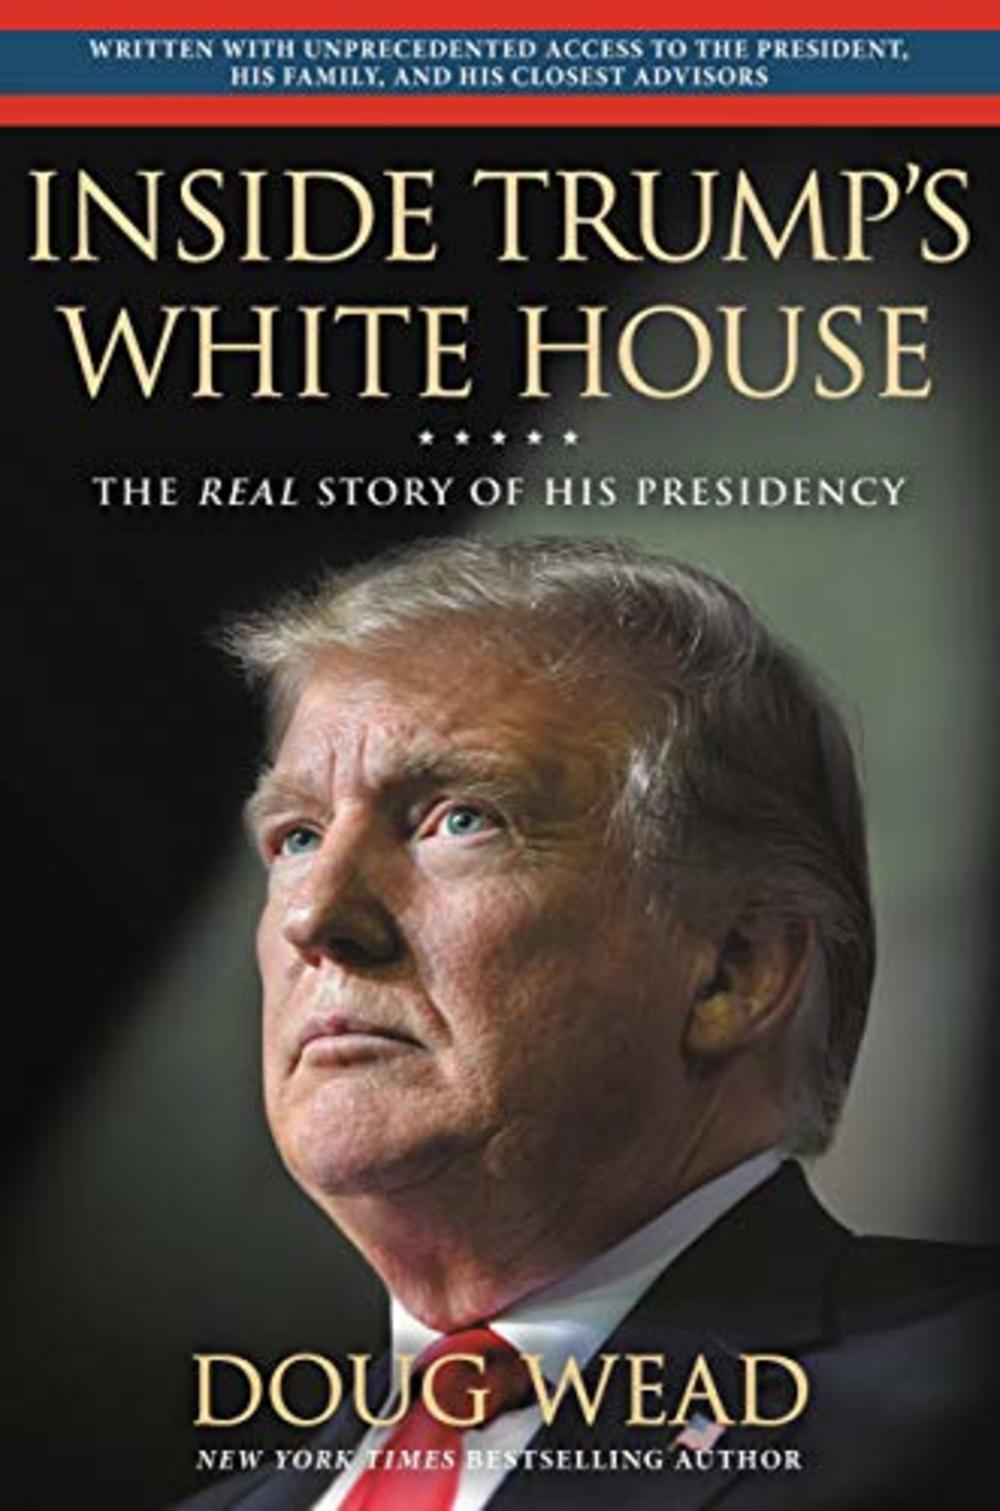 Inside Donald Trump's White House